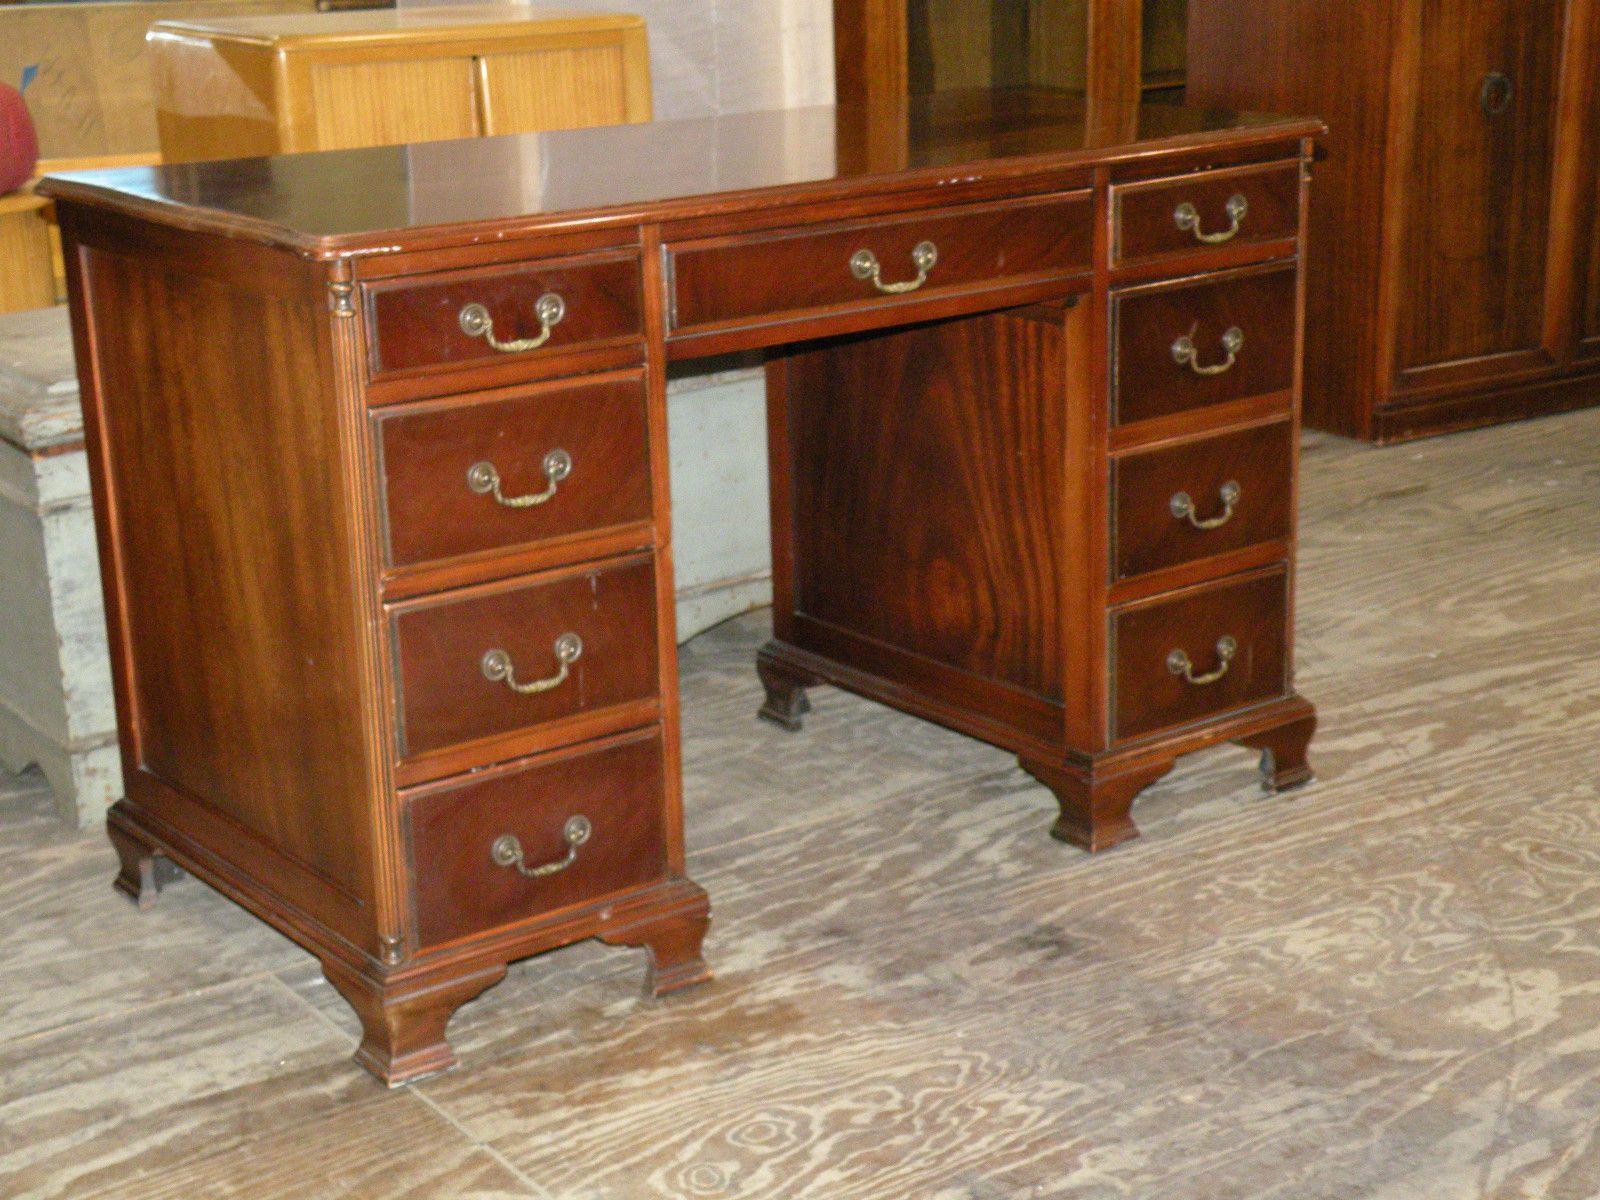 Server buffet federal style solid mahogany w applied flame mahogany - Antique Maddox Mahogany Kneehole Writing Desk Ebay